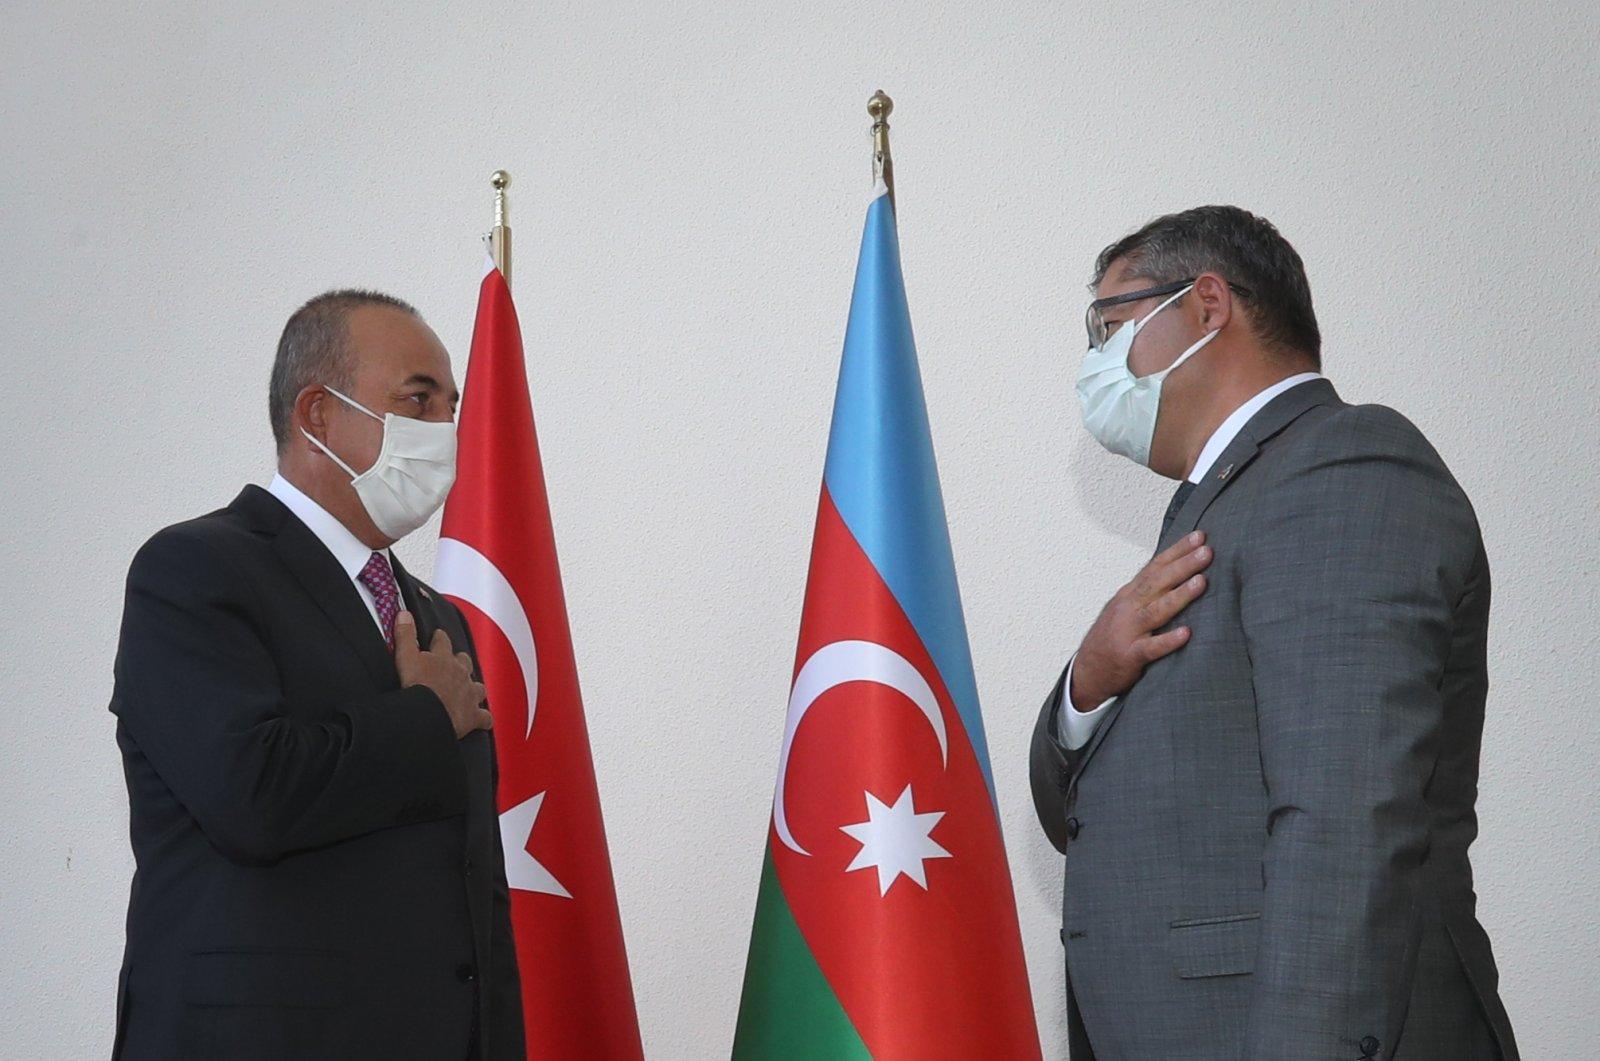 Foreign Minister Mevlüt Çavuşoğlu (L) and Azerbaijani Ambassador to Ankara Khazar Ibrahim gesture during the former's visit to the embassy in Ankara, Sept. 29, 2020 (AA Photo)